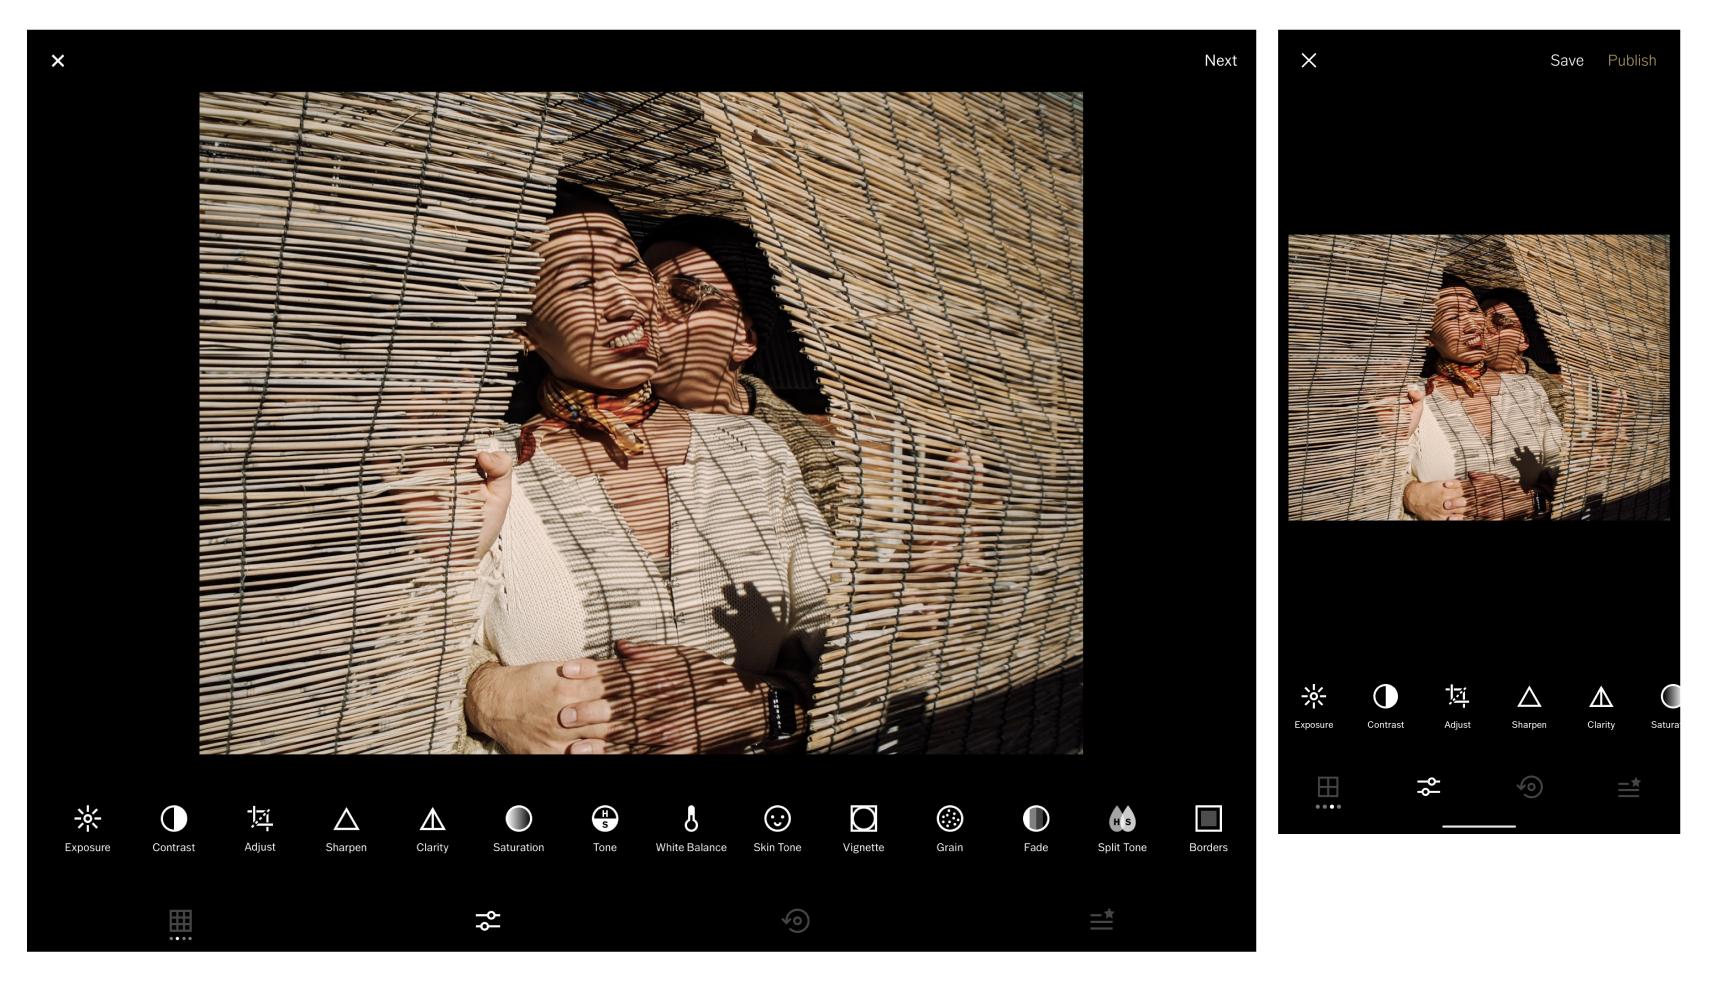 ipad and phone screenshots